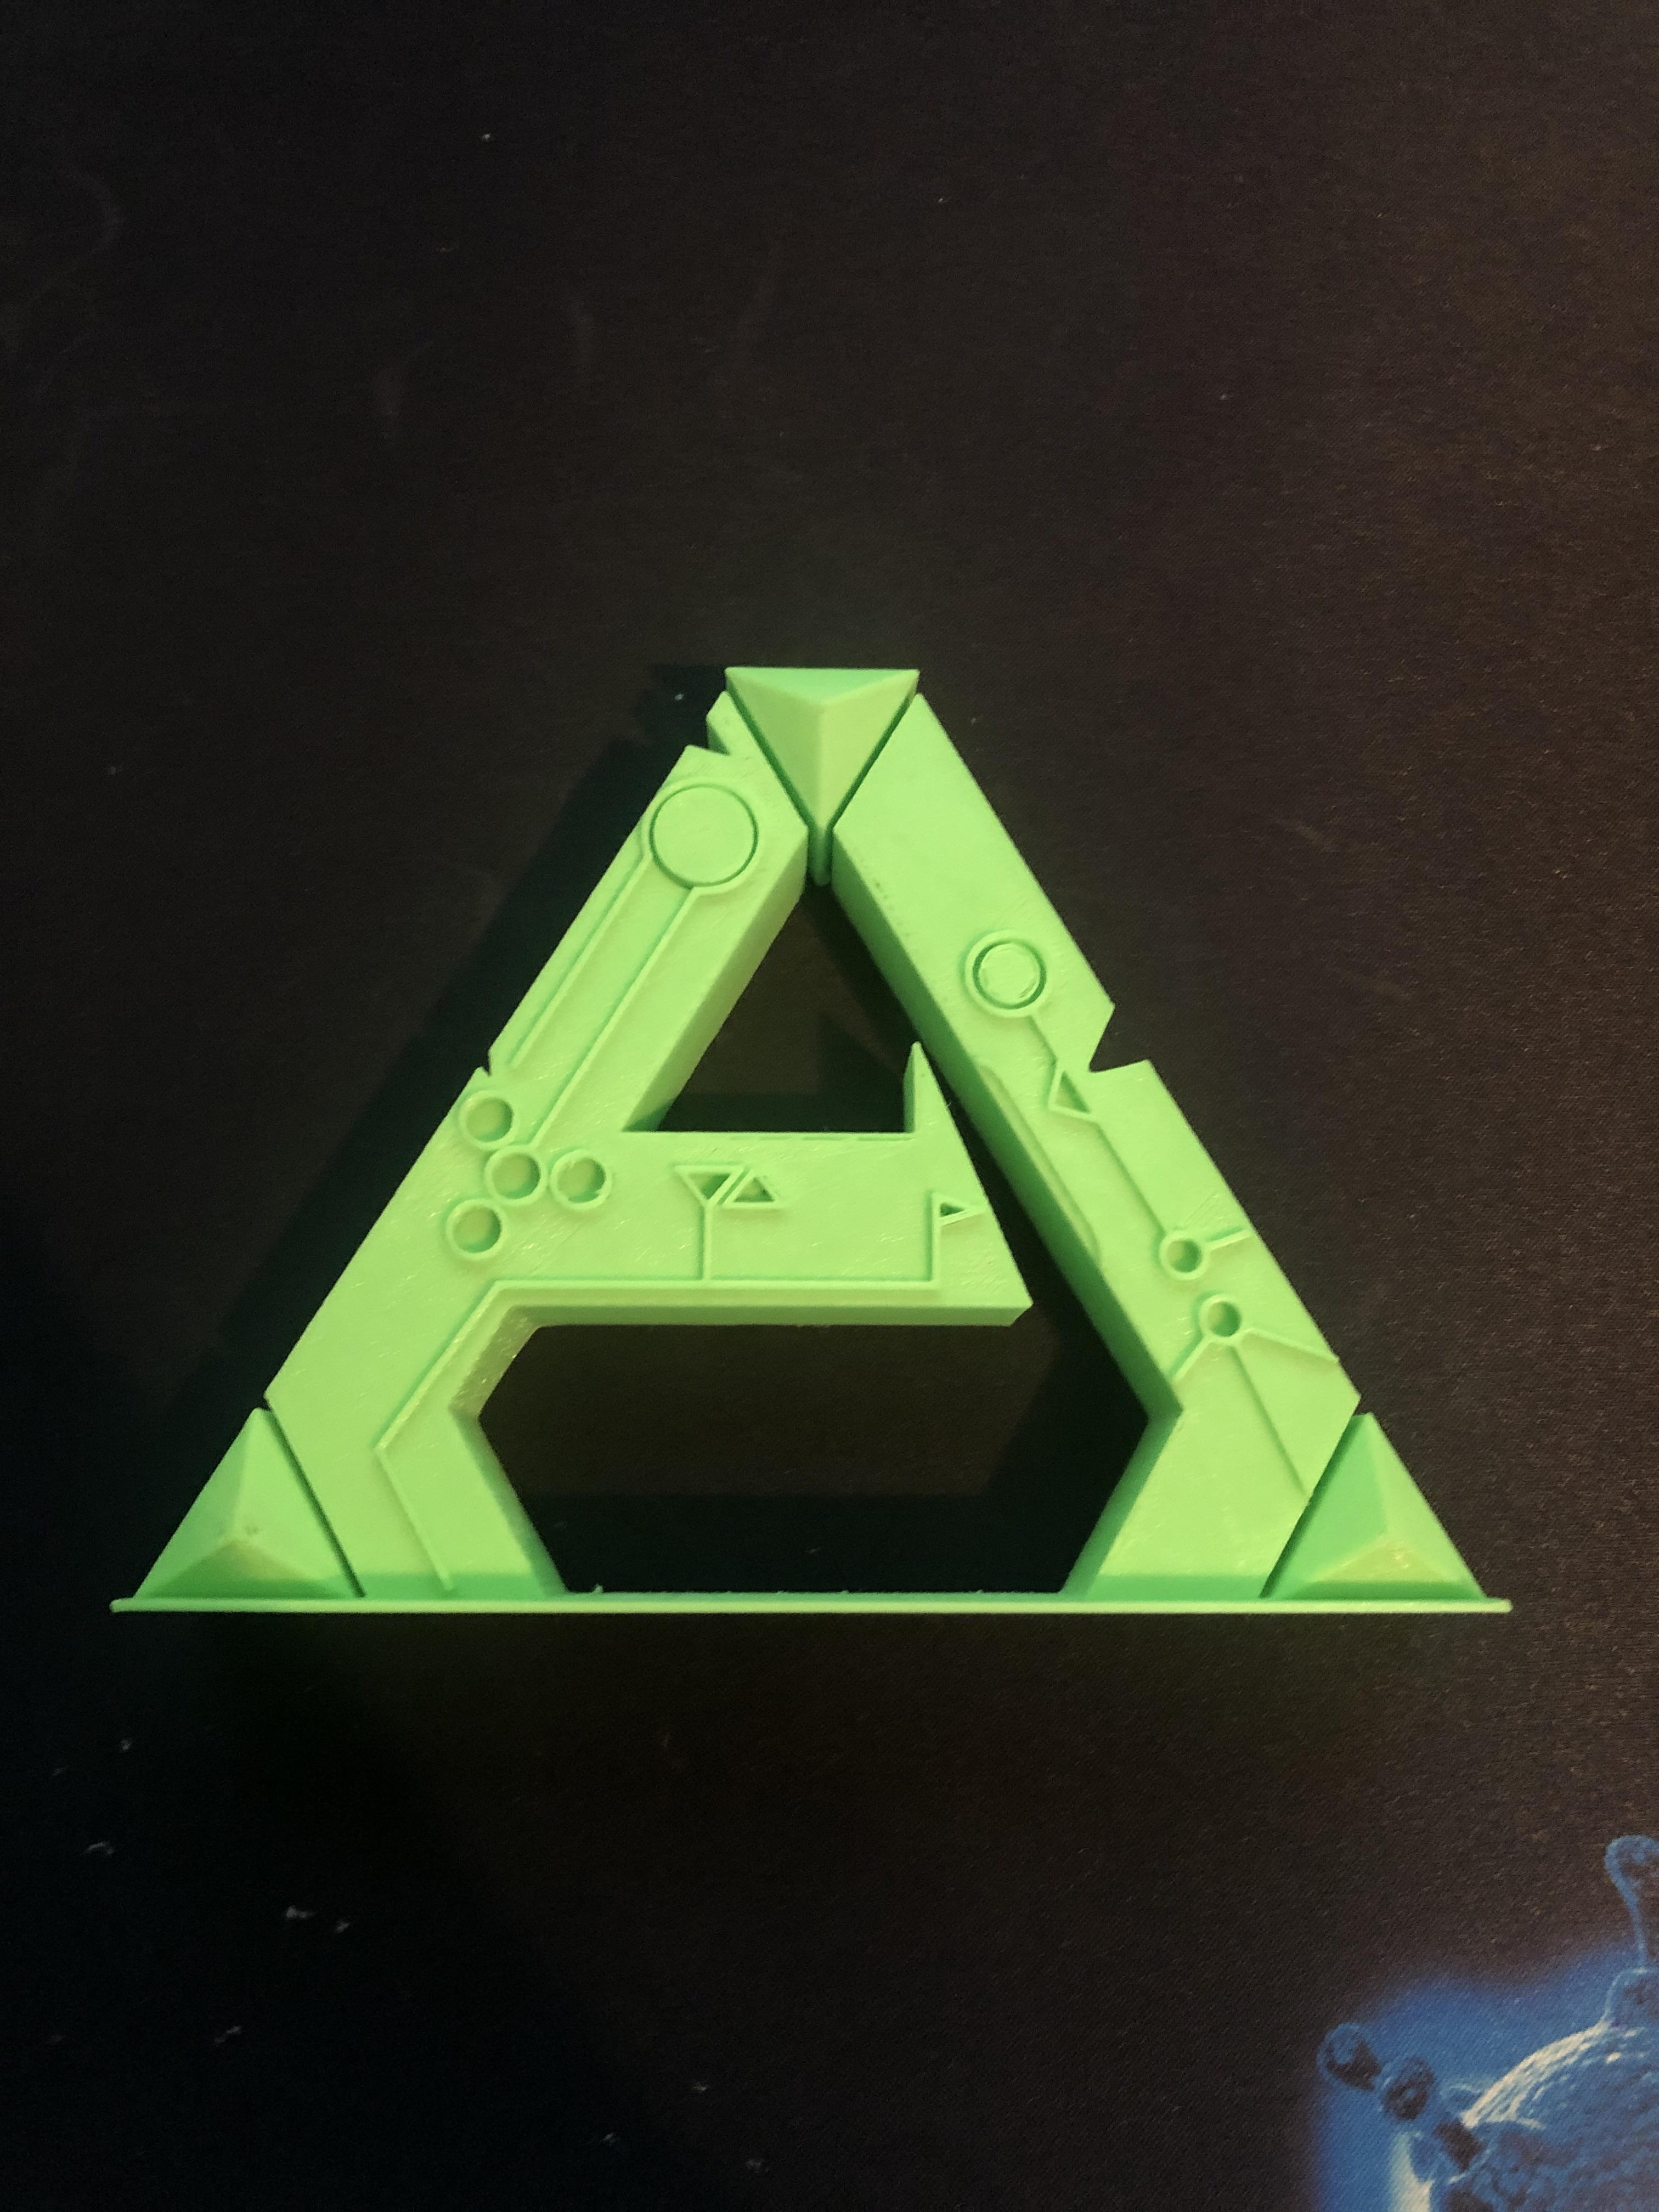 printed model link to